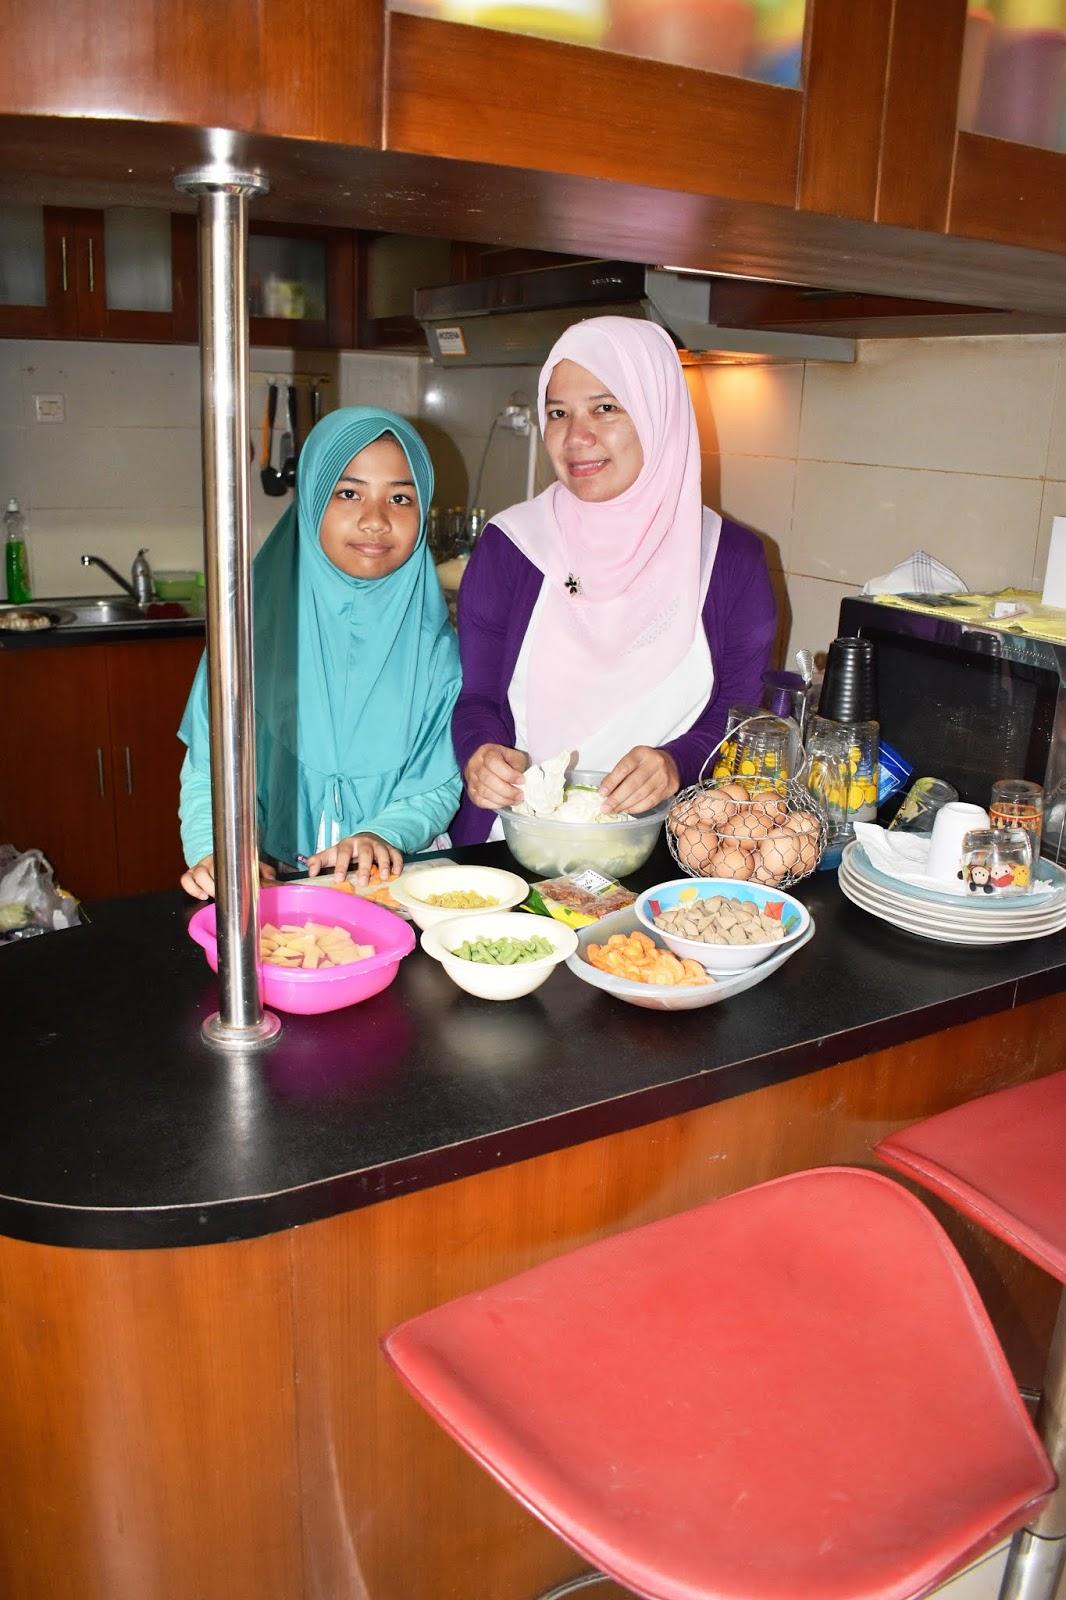 Nurul Sufitri S Blog Masak Bersama Barbie Resep Es Teler Cupcakes Ala Chef Stella Lowis